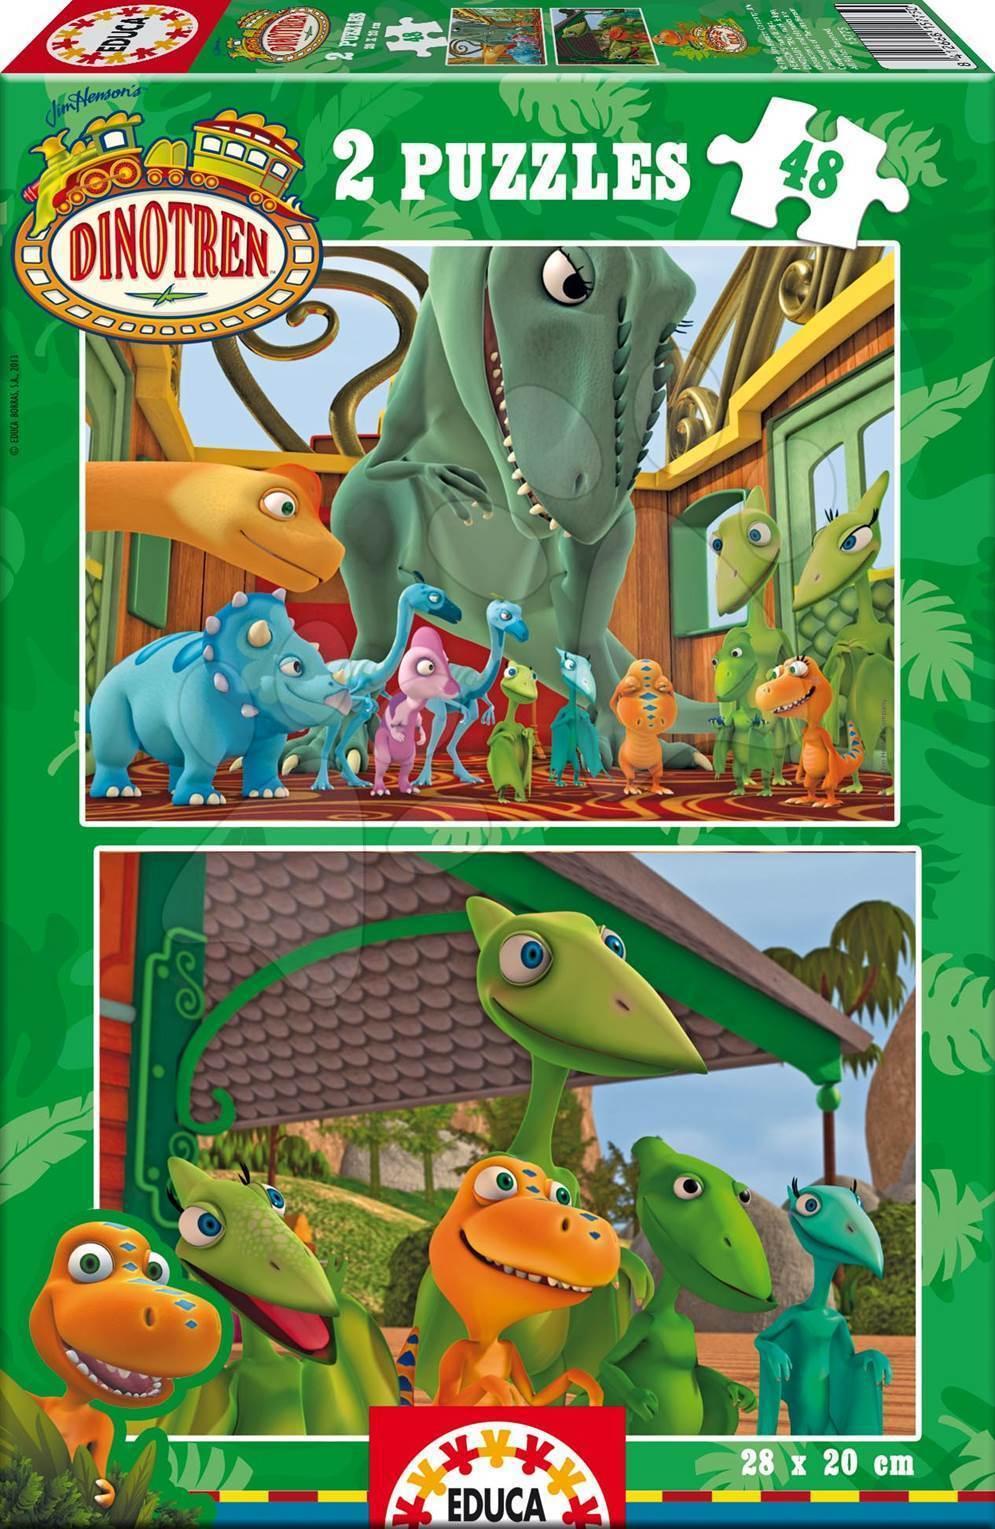 Detské puzzle do 100 dielov - Puzzle Dinotren Educa 2x 48 dielov